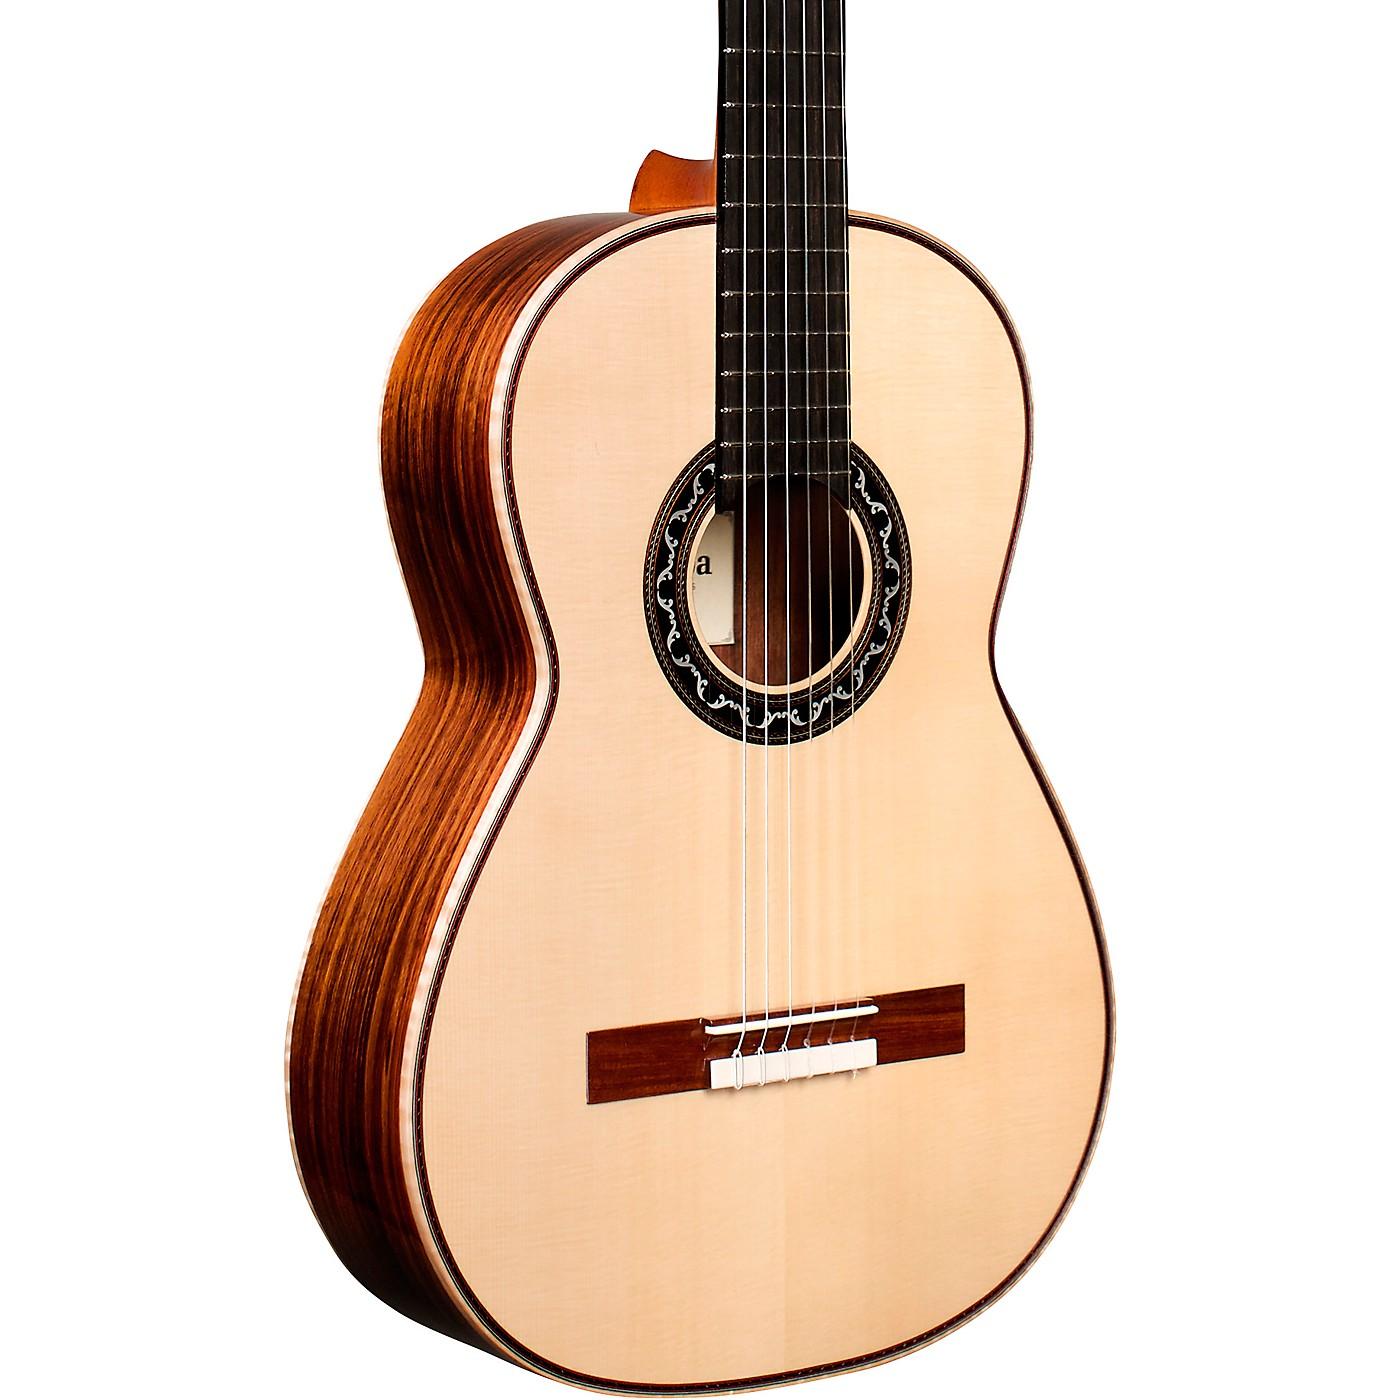 Cordoba Esteso SP Spruce Top Luthier Select Acoustic Classical Guitar thumbnail